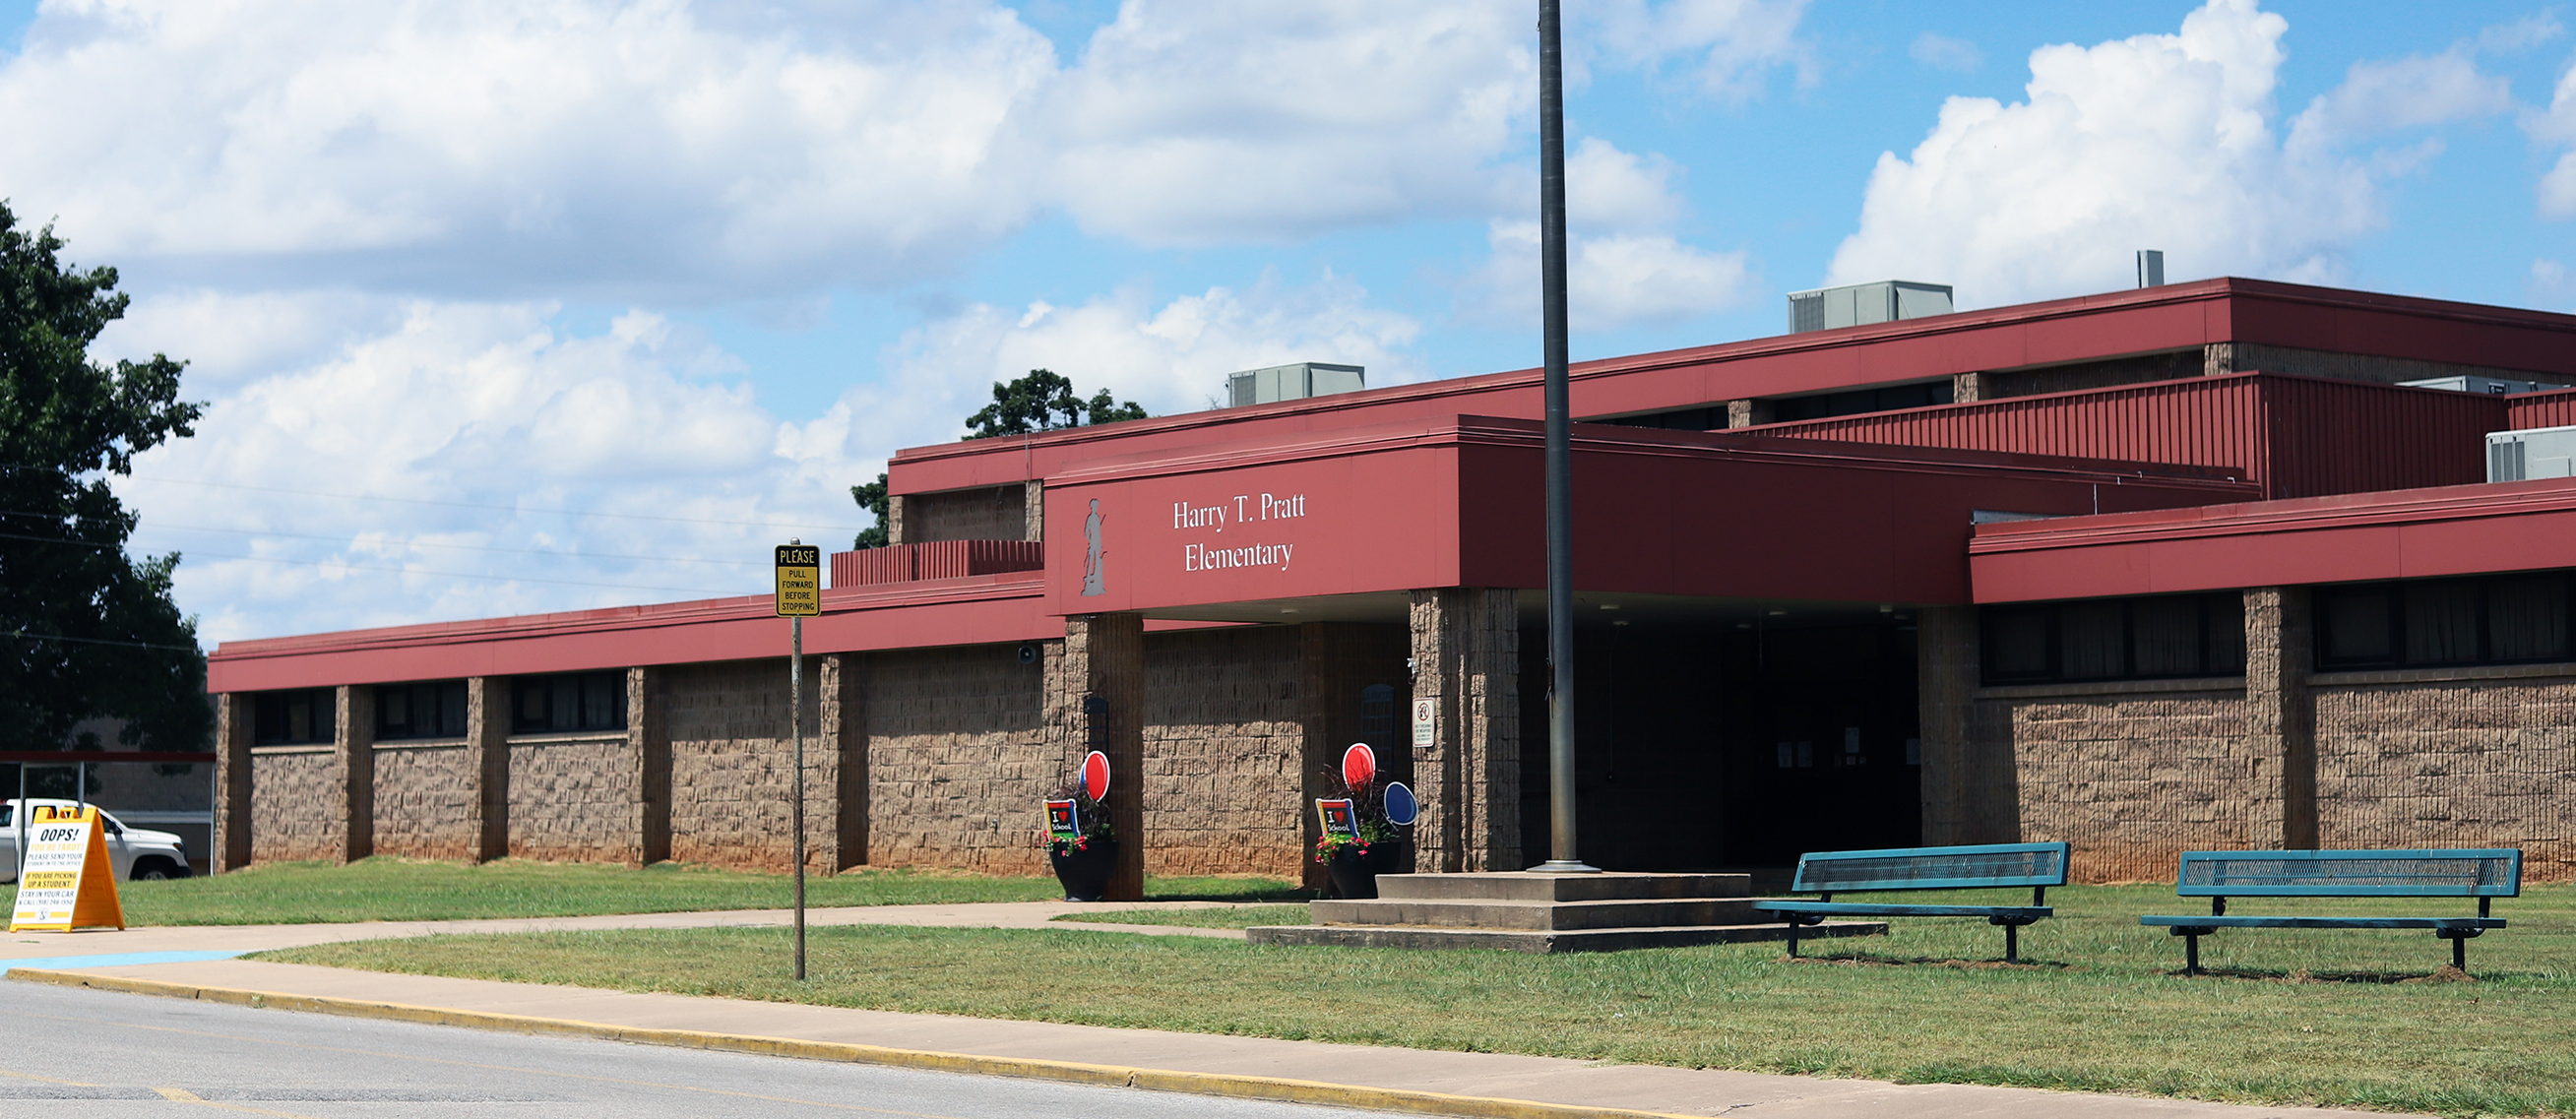 Pratt Elementary